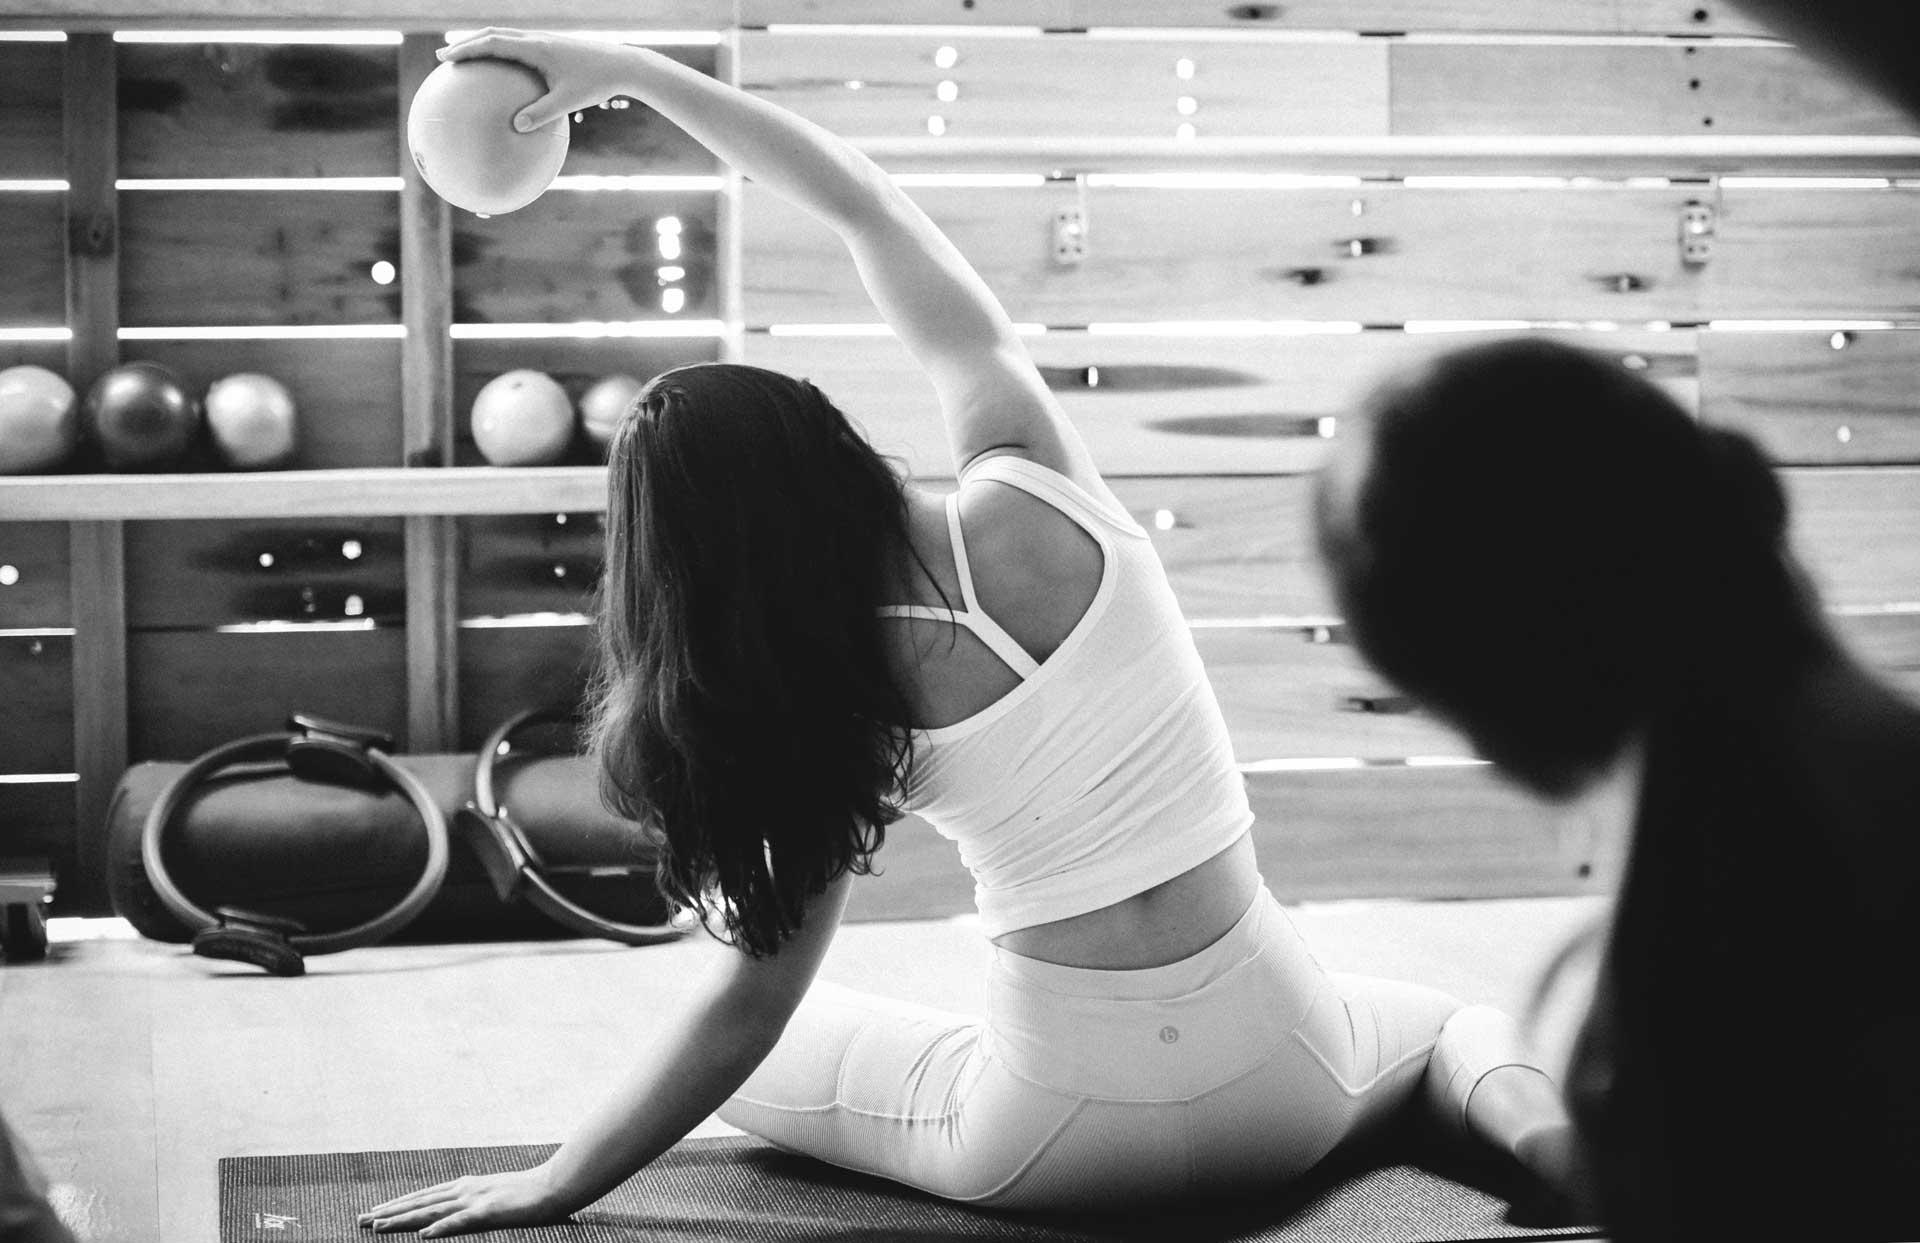 Northern Rivers Pilates mat classes Lismore NSW Australia